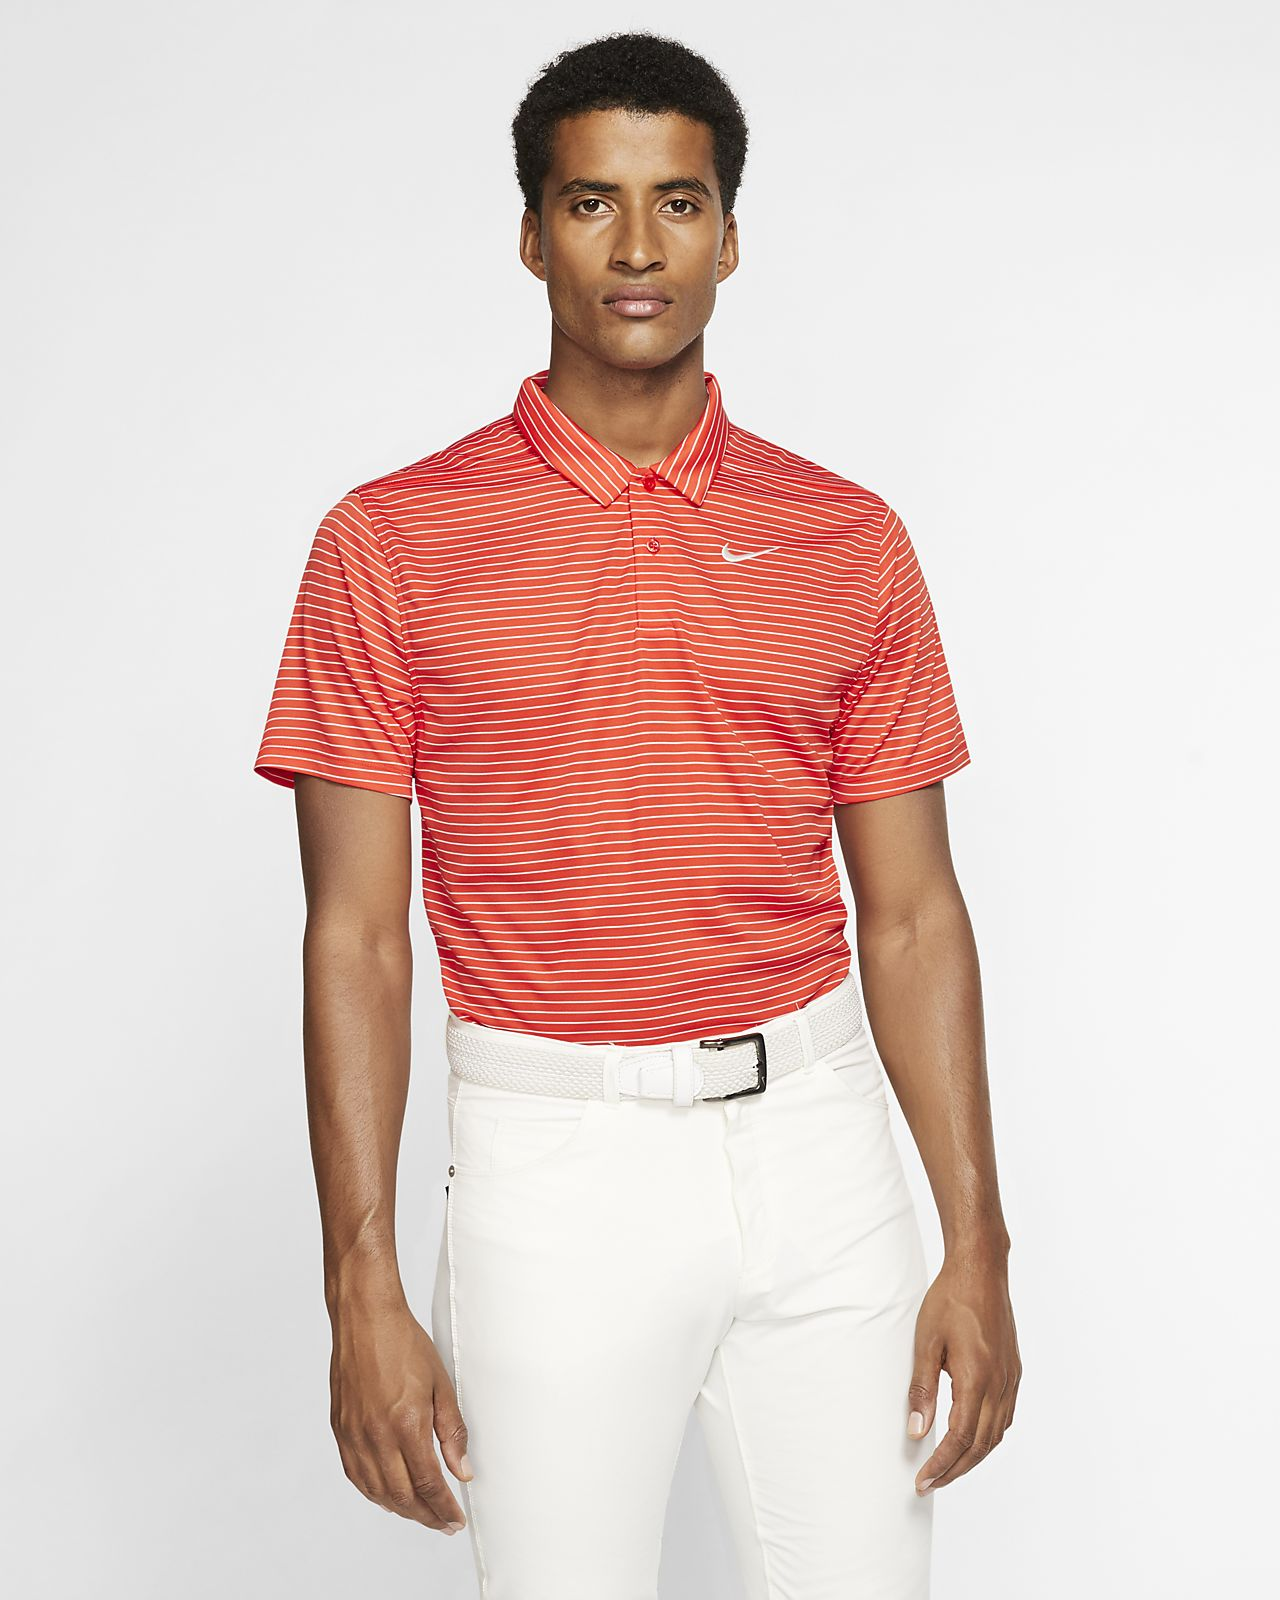 Nike Dri-FIT csíkos, galléros férfi golfpóló